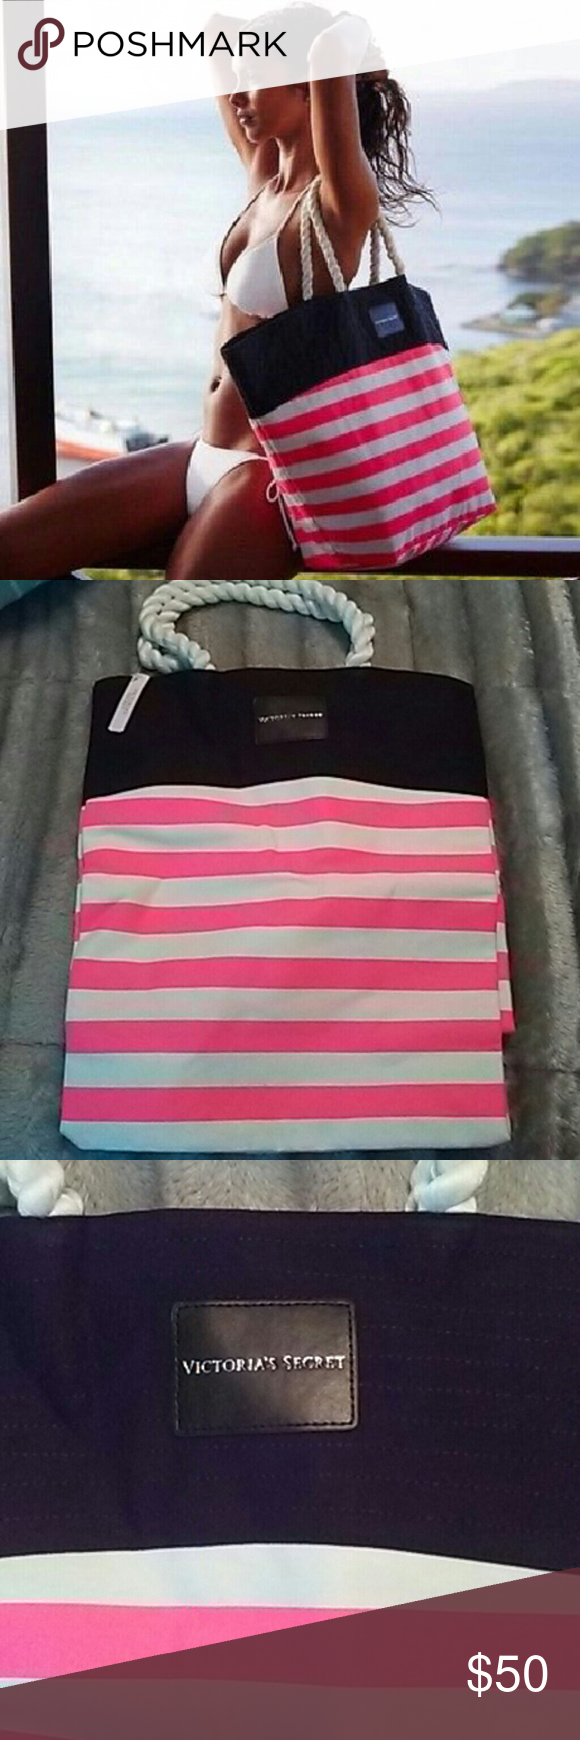 Victoria's Secret bag NWT Brand new Victoria secret bag. Super cute! Victoria's Secret Bags